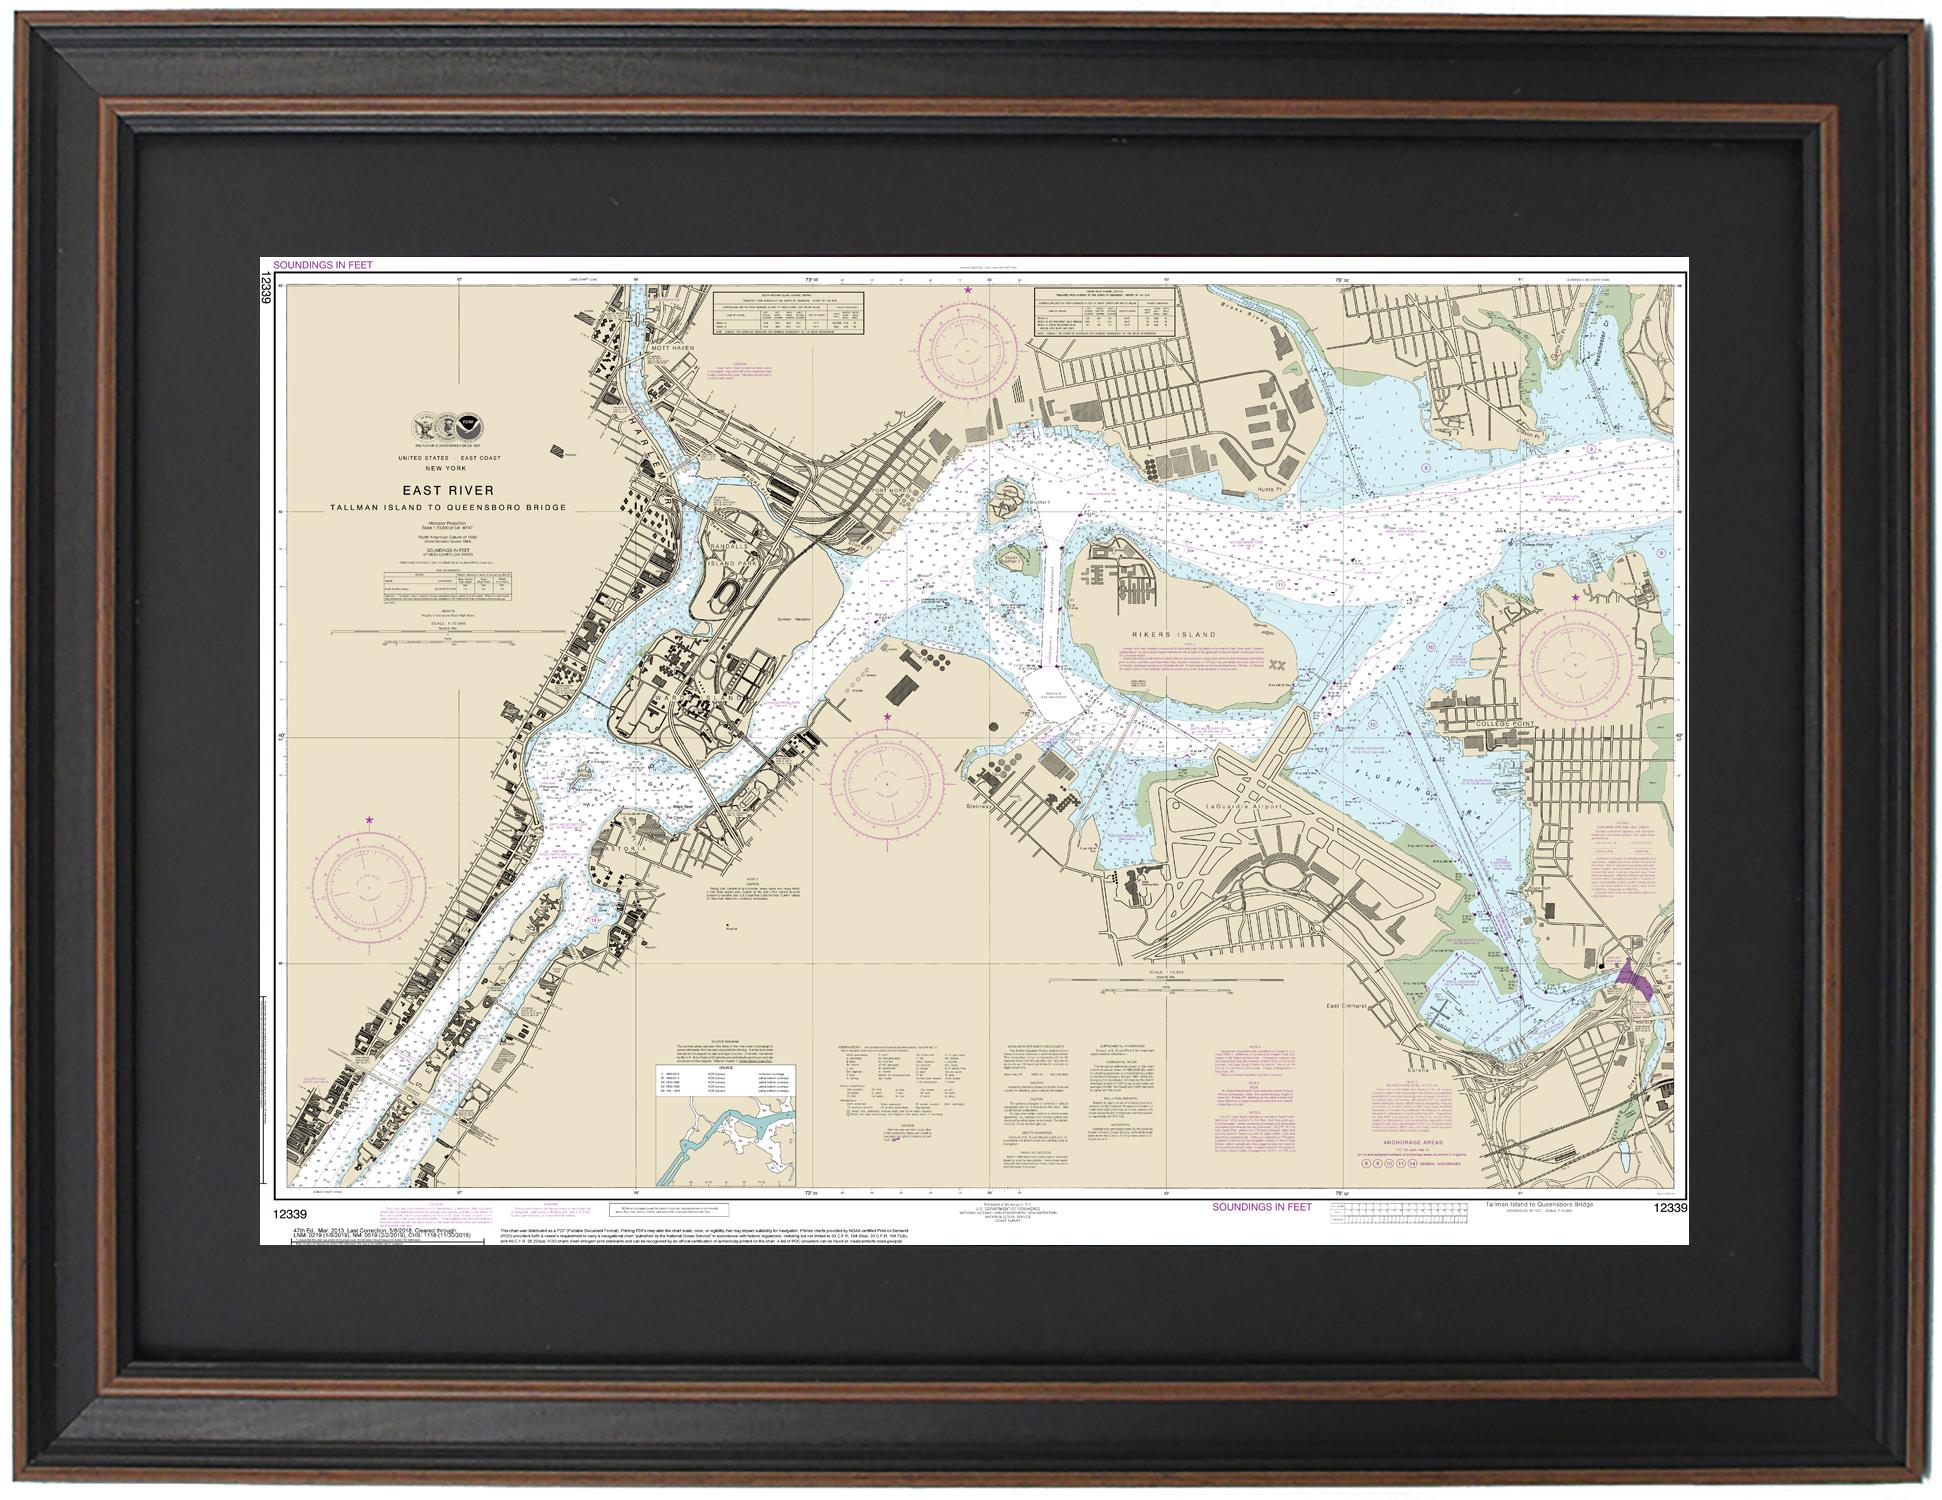 Framed Nautical Maps Framed Nautical Map 12339 East River Ny